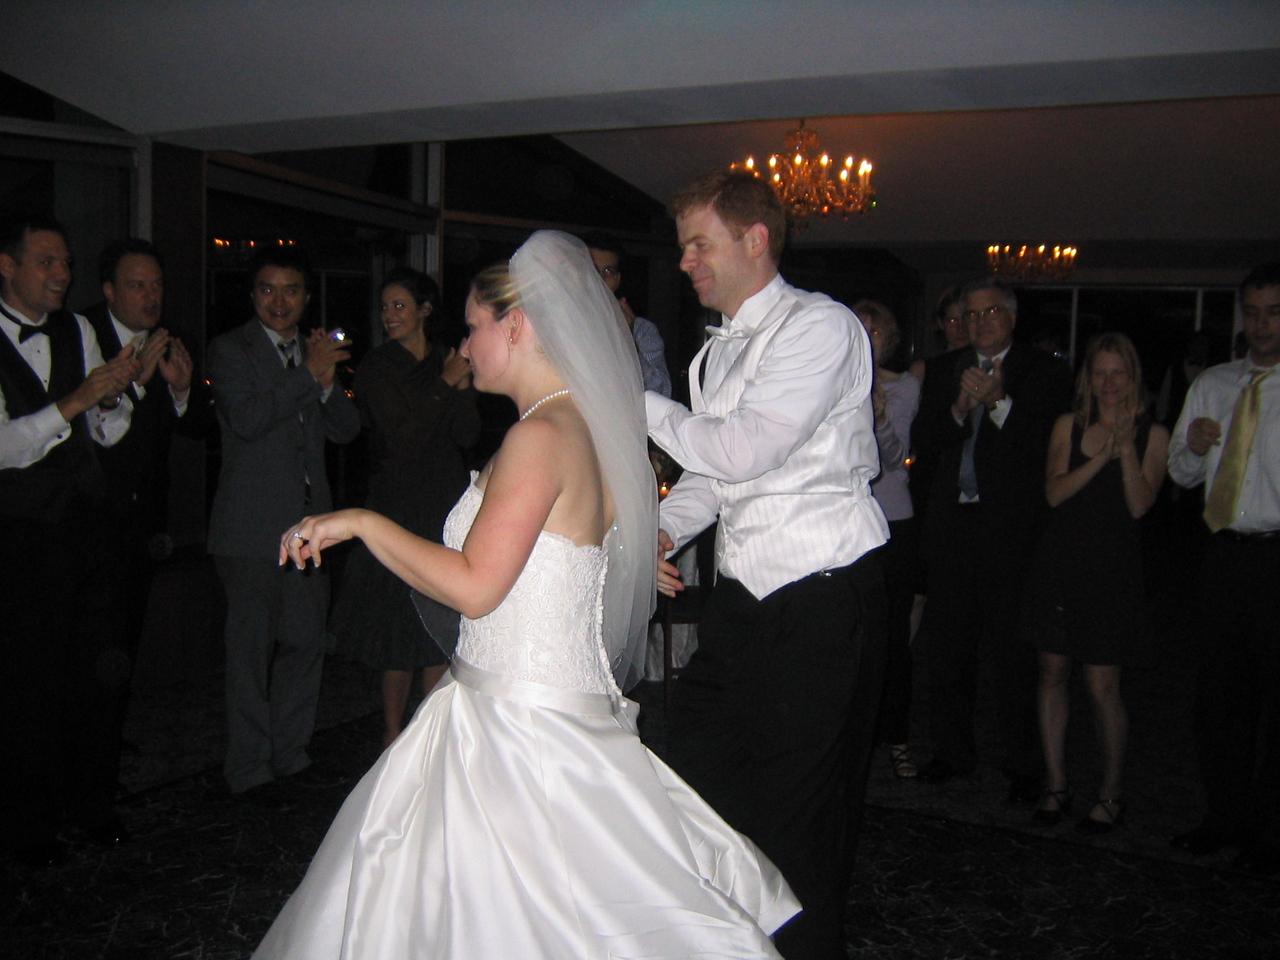 Dan CAN dance!